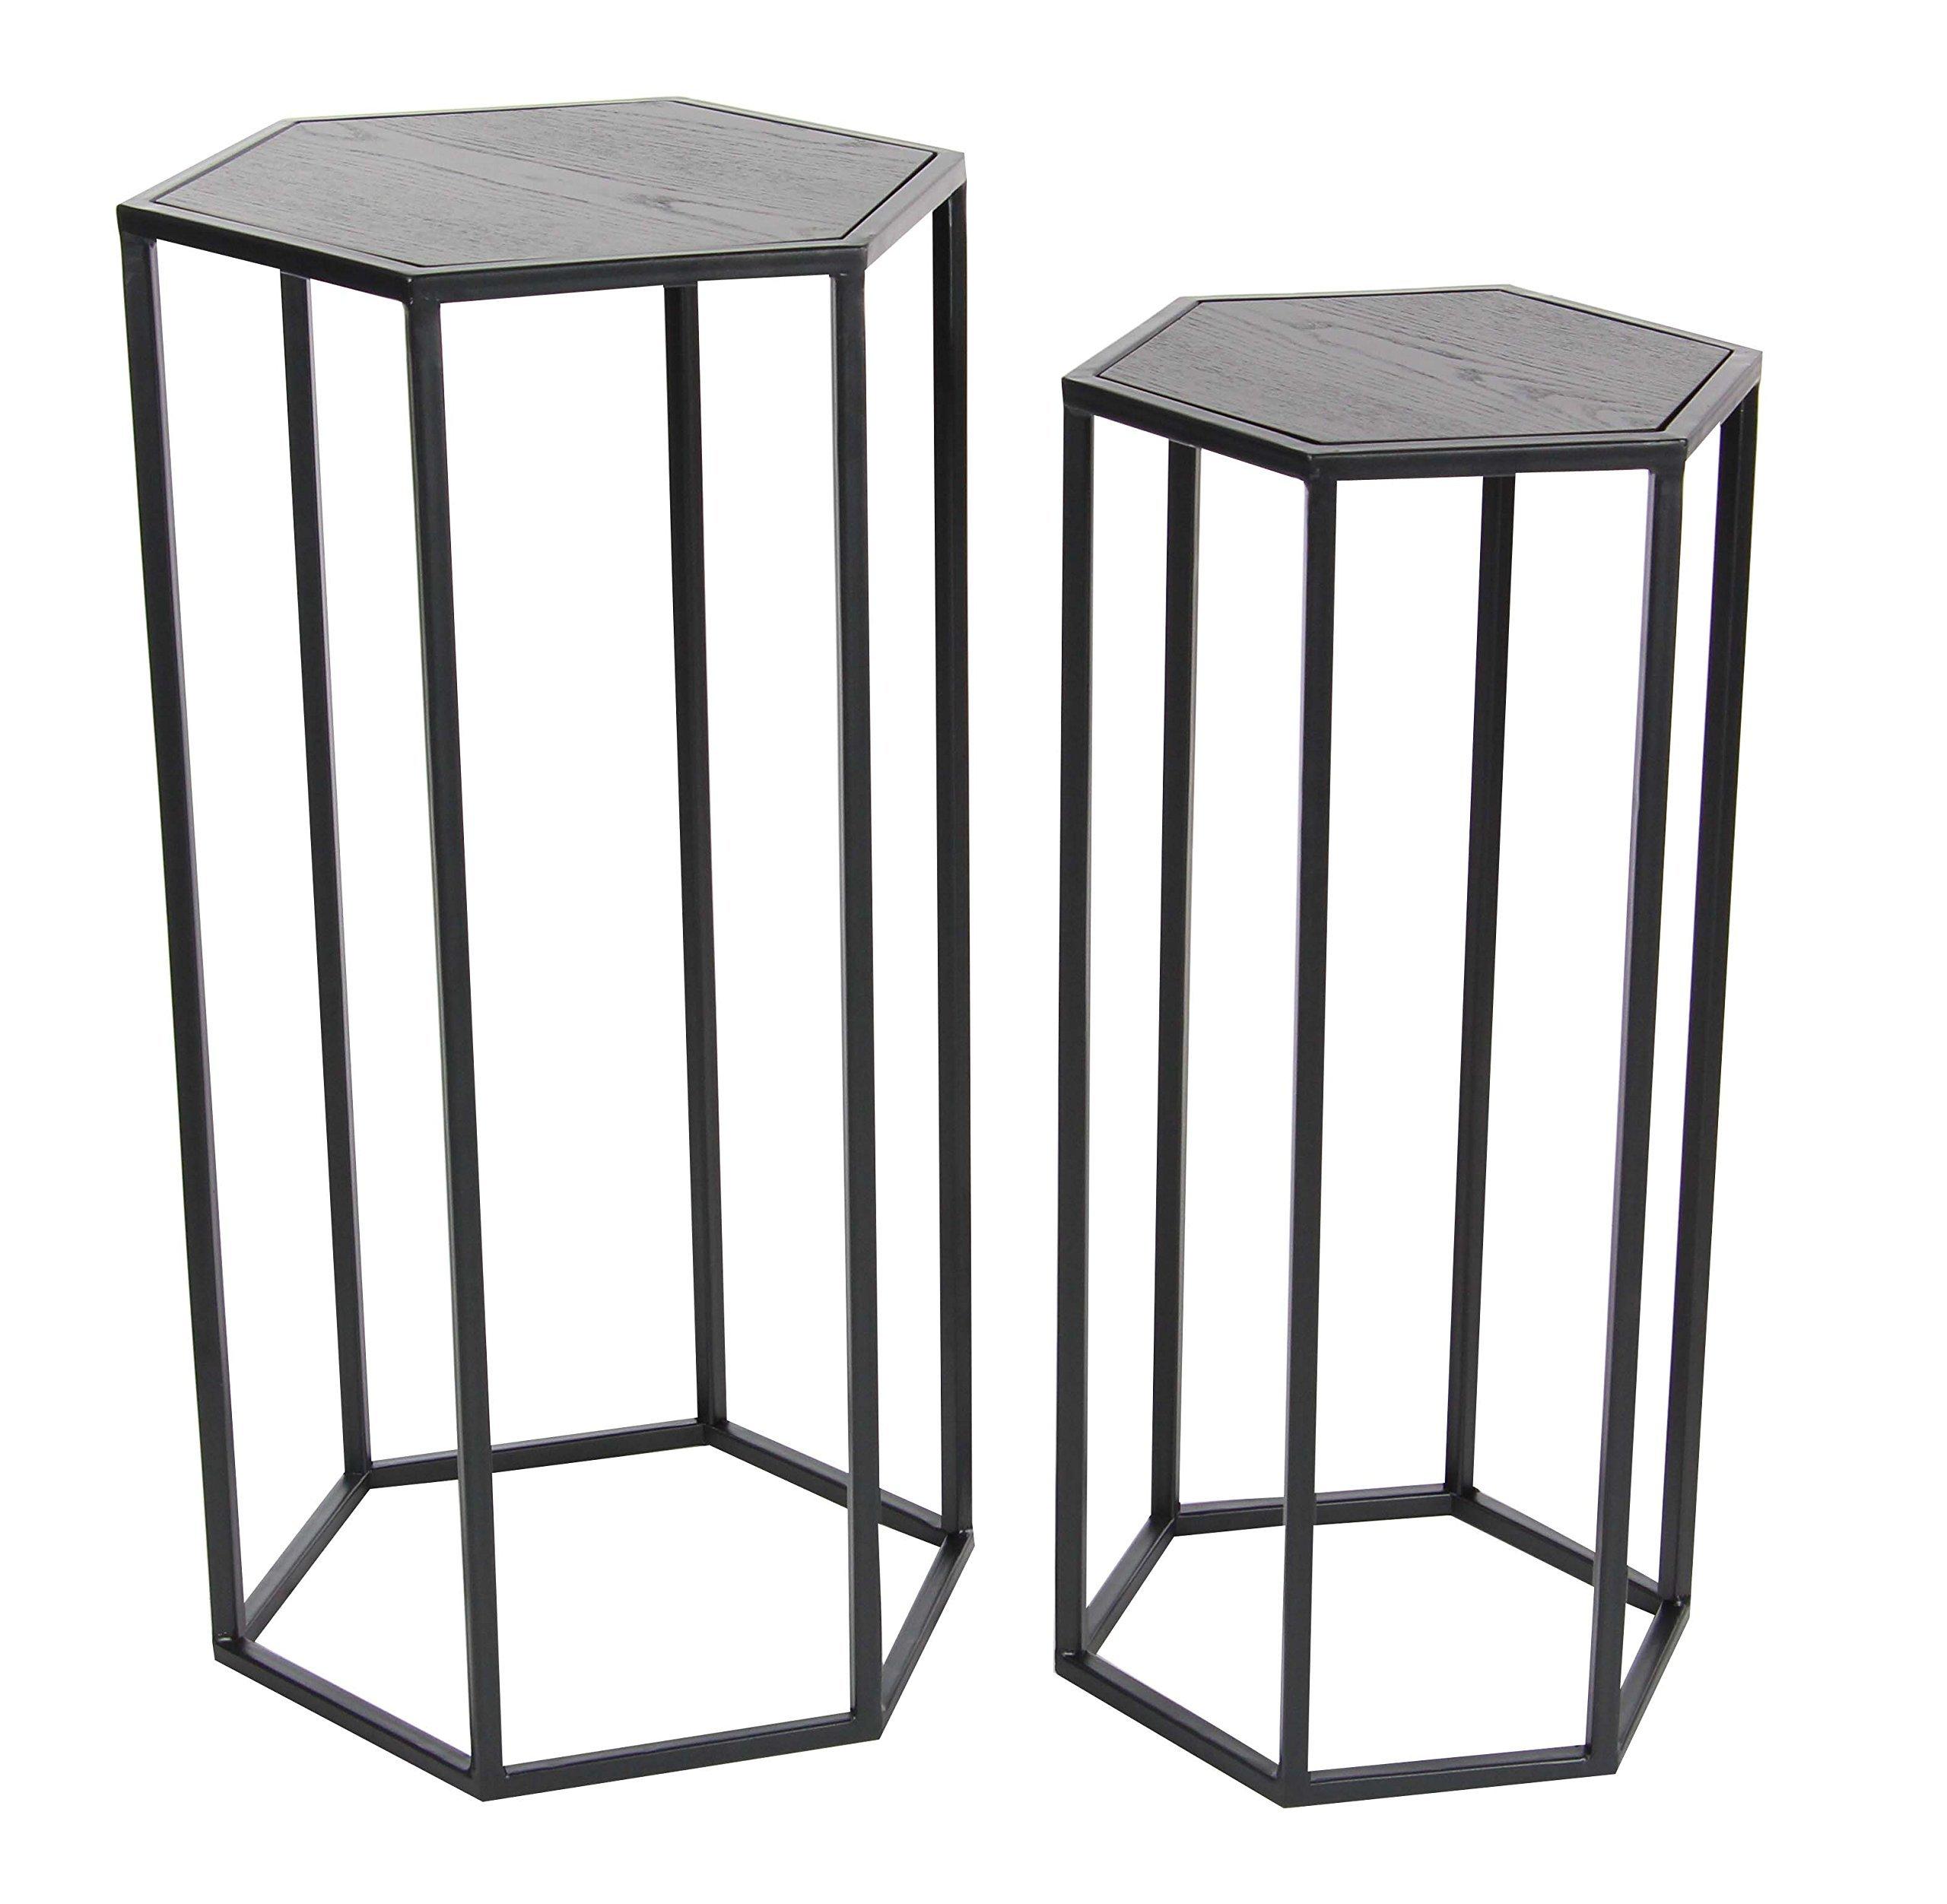 Deco 79 65631 Metal and Wood Pedestal Set of 2, 25'' H, 27'' H, Gray/Black